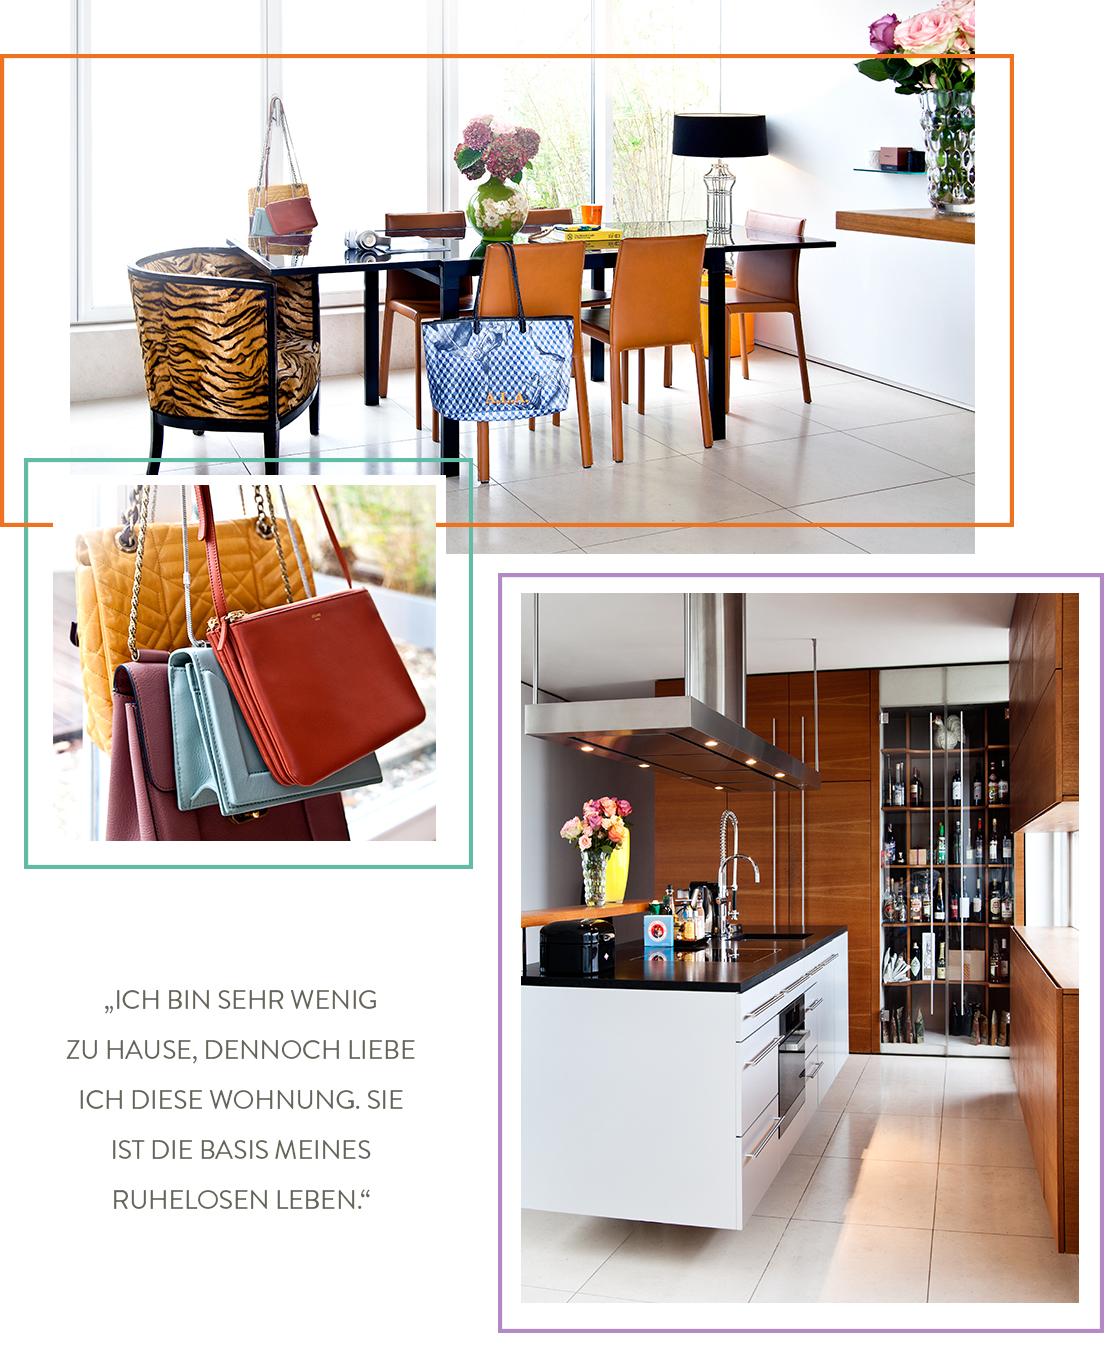 Westwing-Homestory-Ala-Zander-Esszimmer-Kueche